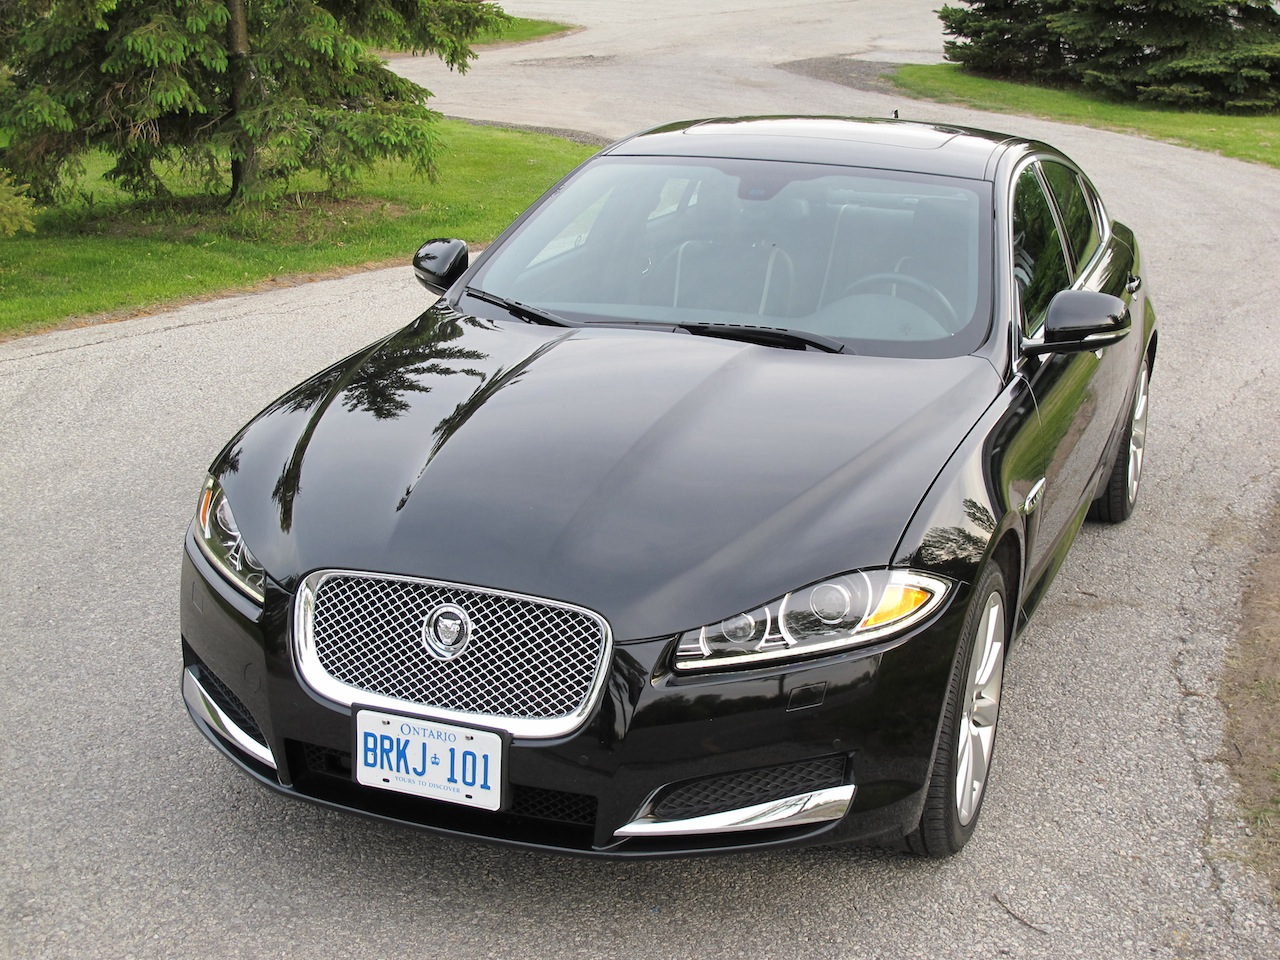 2013 Jaguar Xf Awd Review Cars Photos Test Drives And